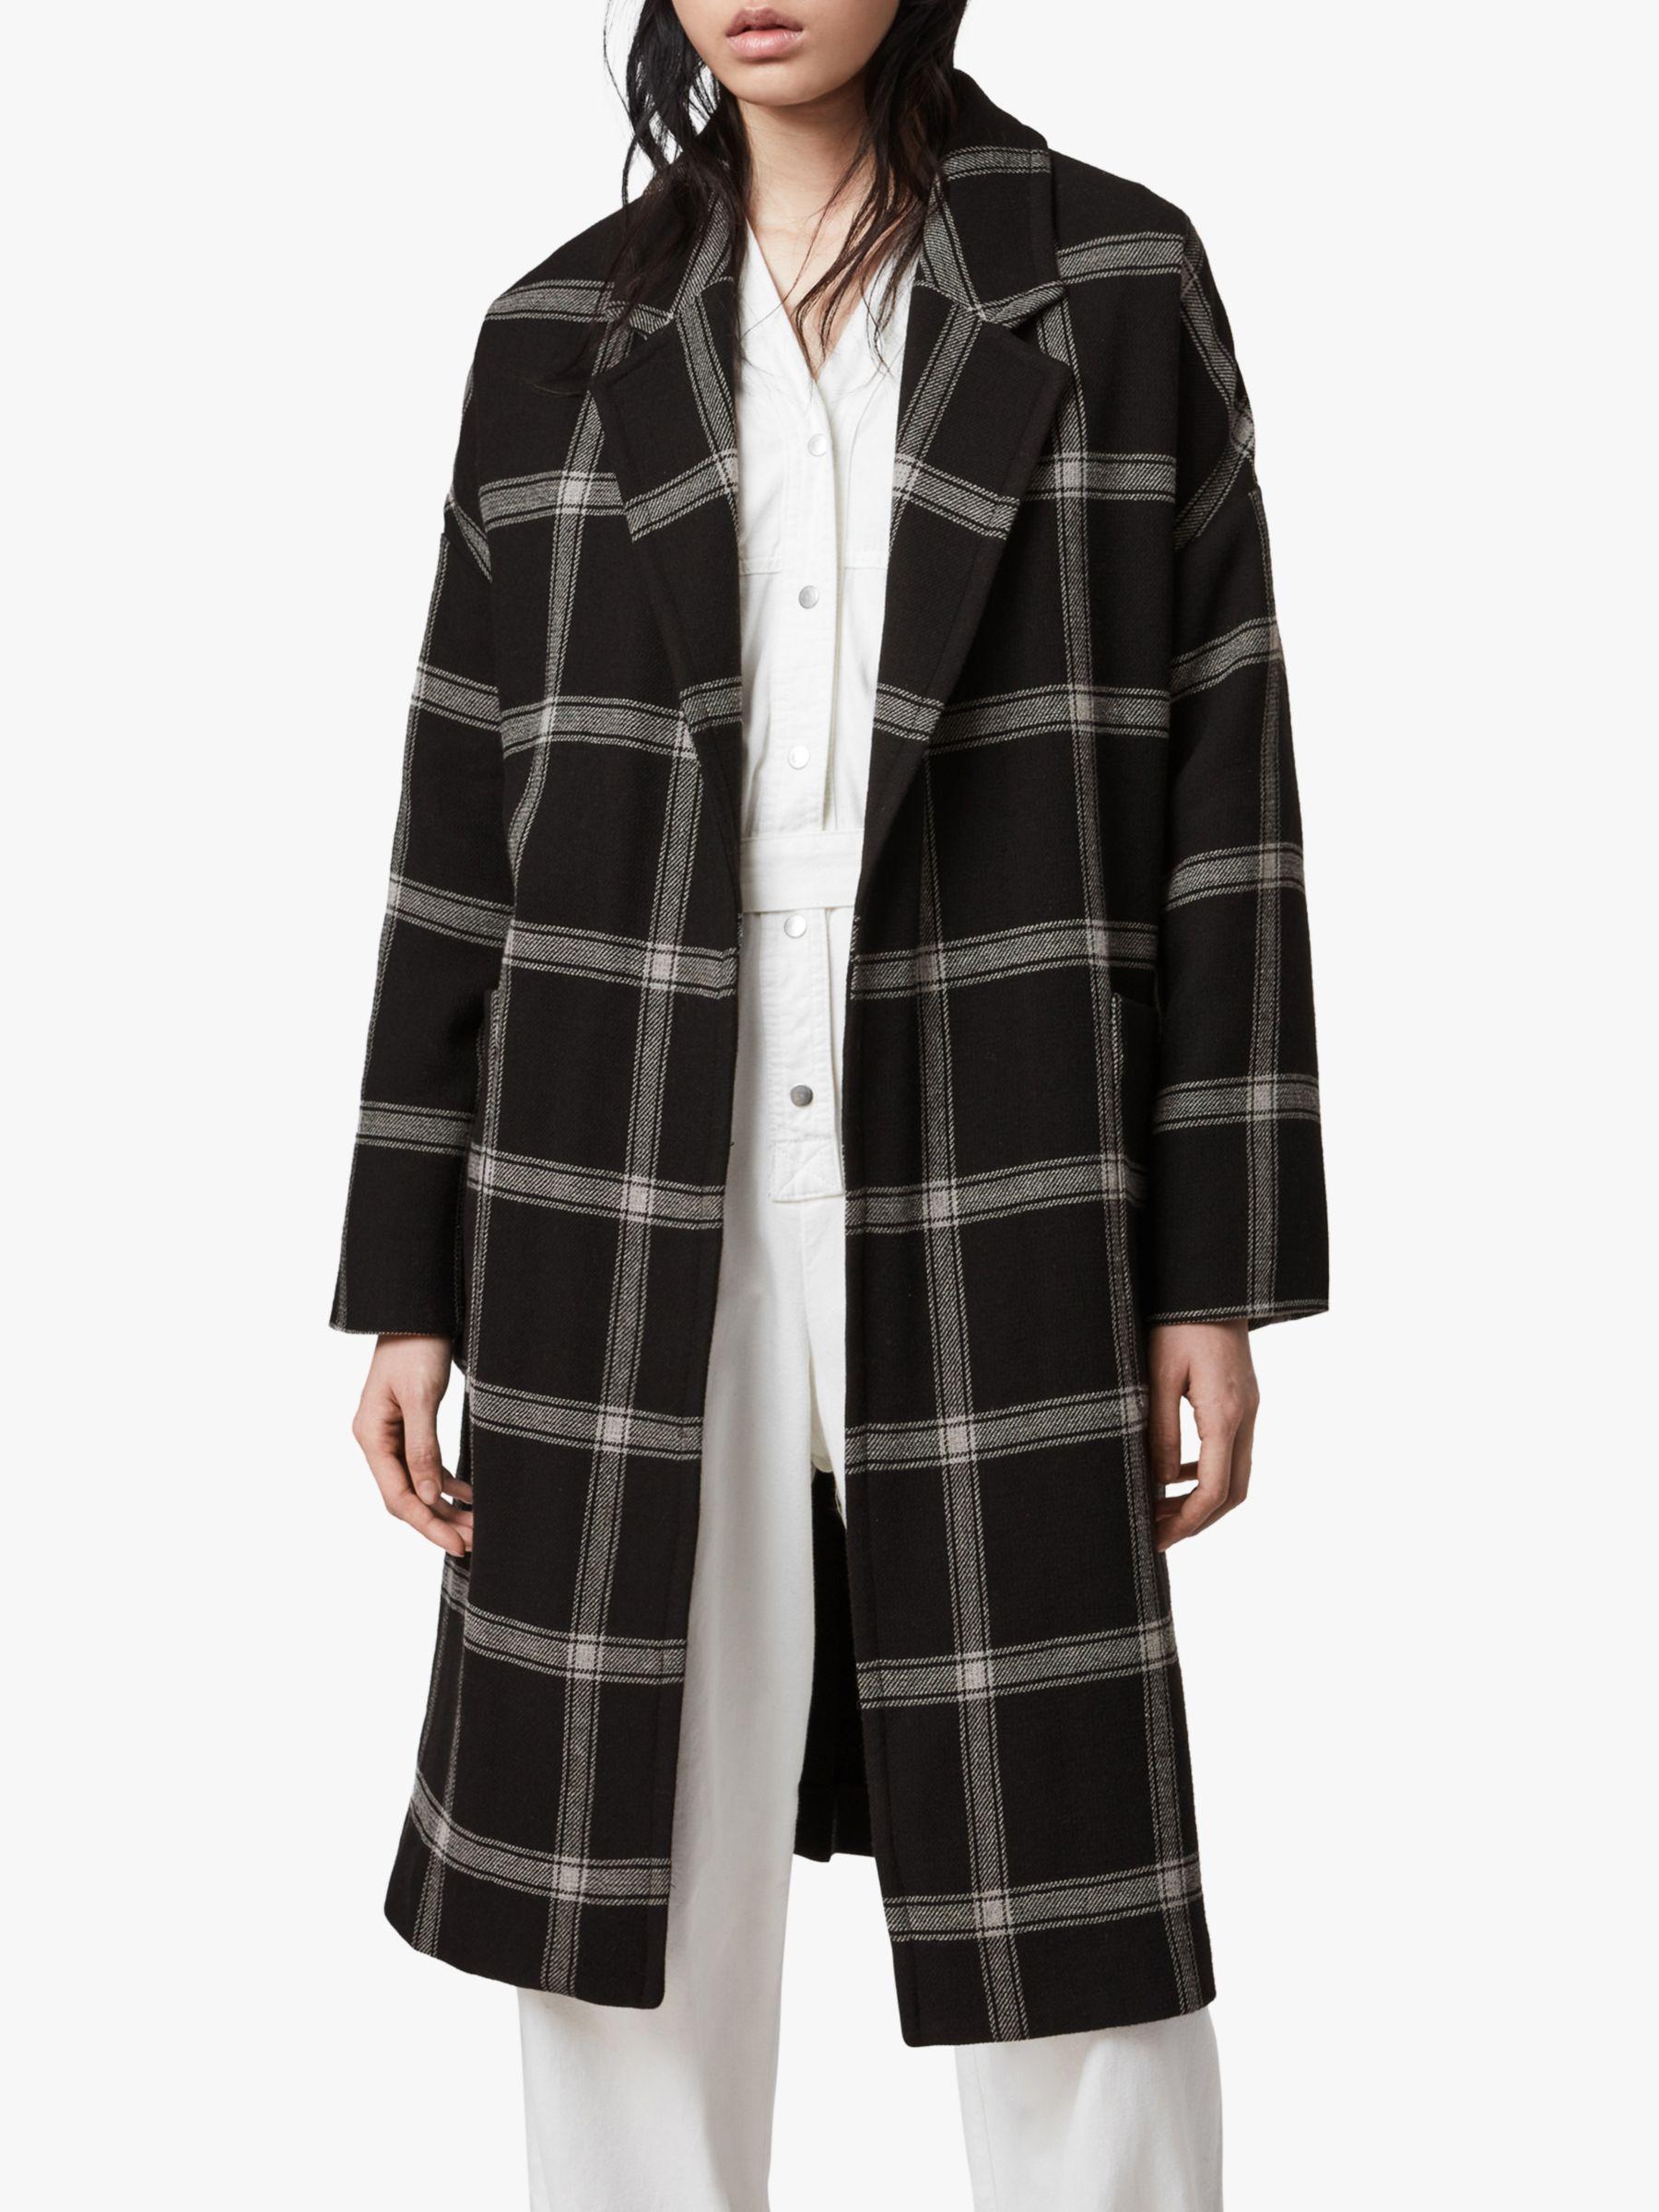 AllSaints AllSaints Lara Check Relaxed Fit Coat, Black/Light Grey